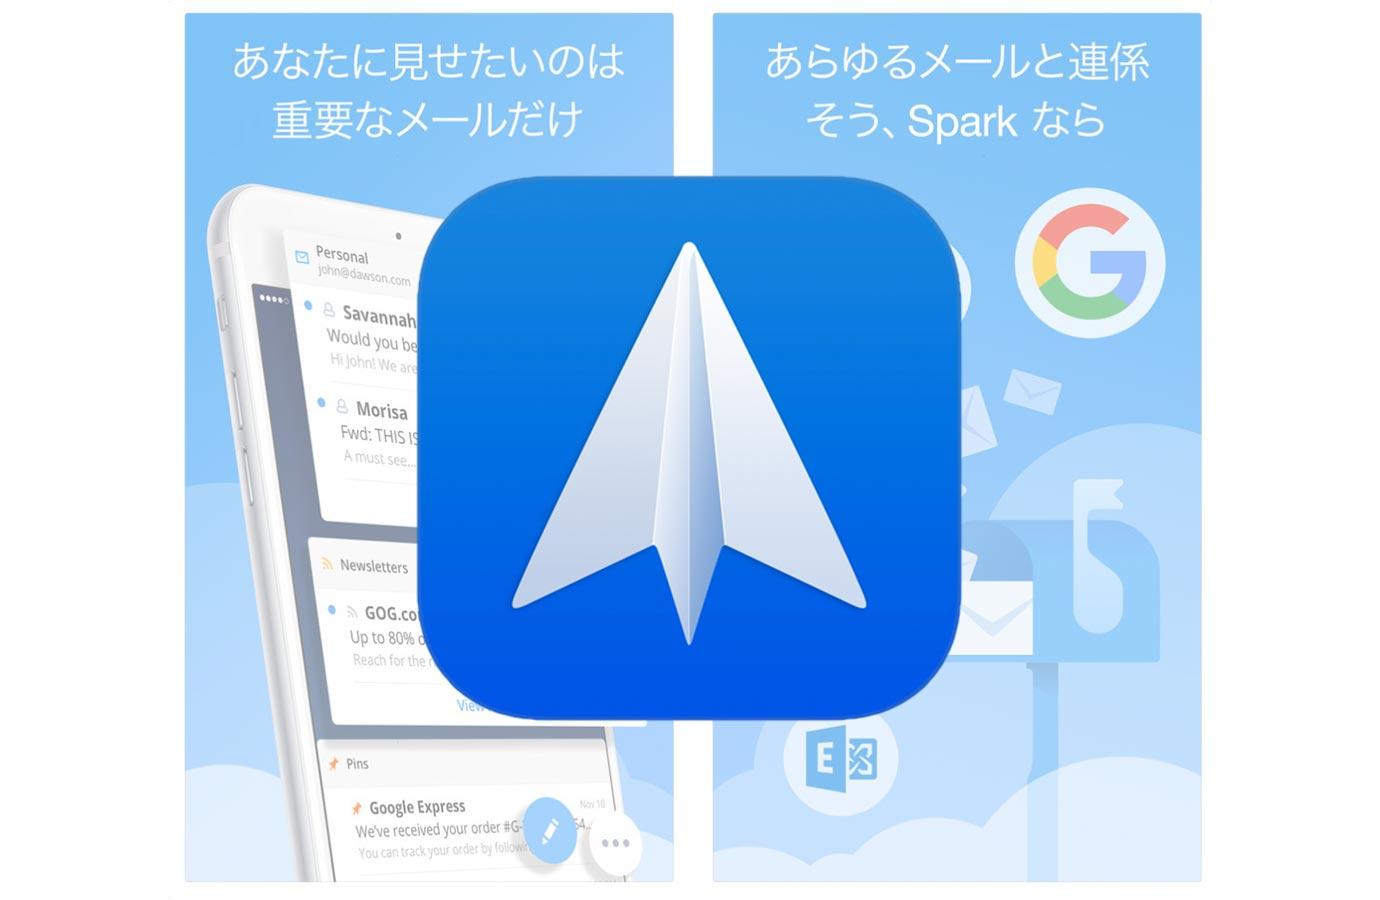 iOS向けメールアプリ「Spark by Readdle」がアップデートでメールの送信予約などが可能に